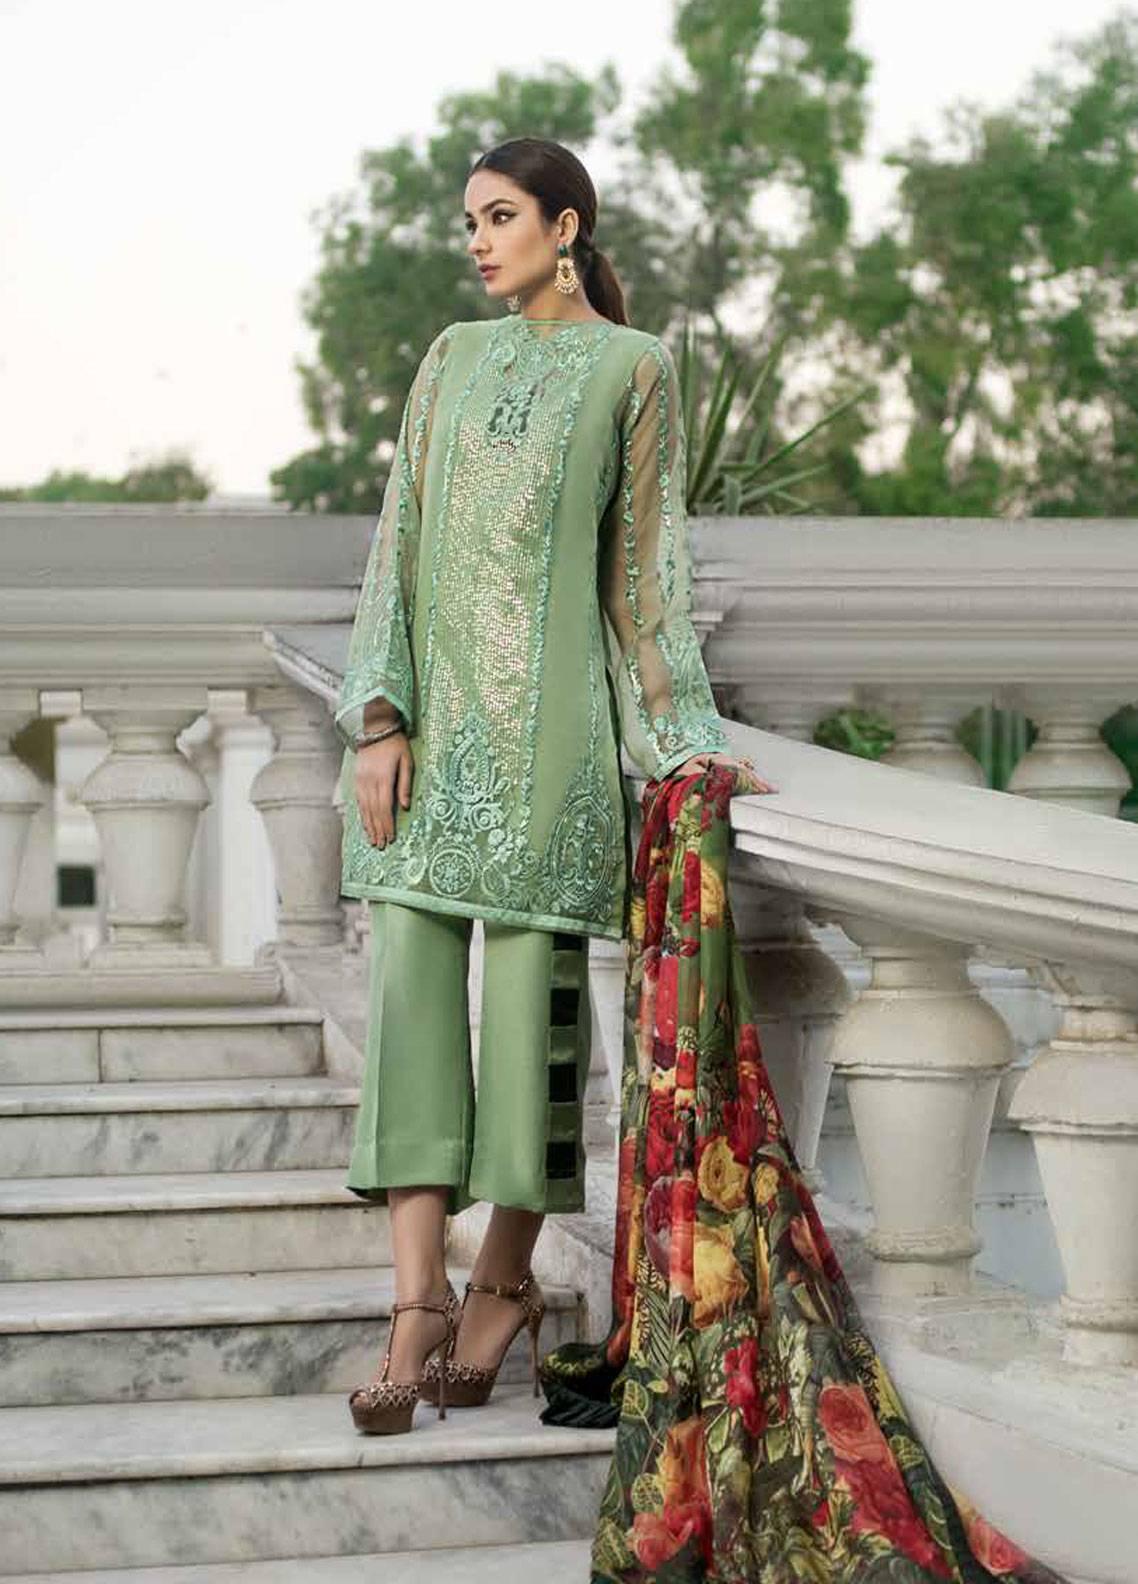 Honey Waqar By ZS Textile Embroidered Organza Unstitched 3 Piece Suit HWC19EC 07 Reine Des Fleur - Luxury Collection